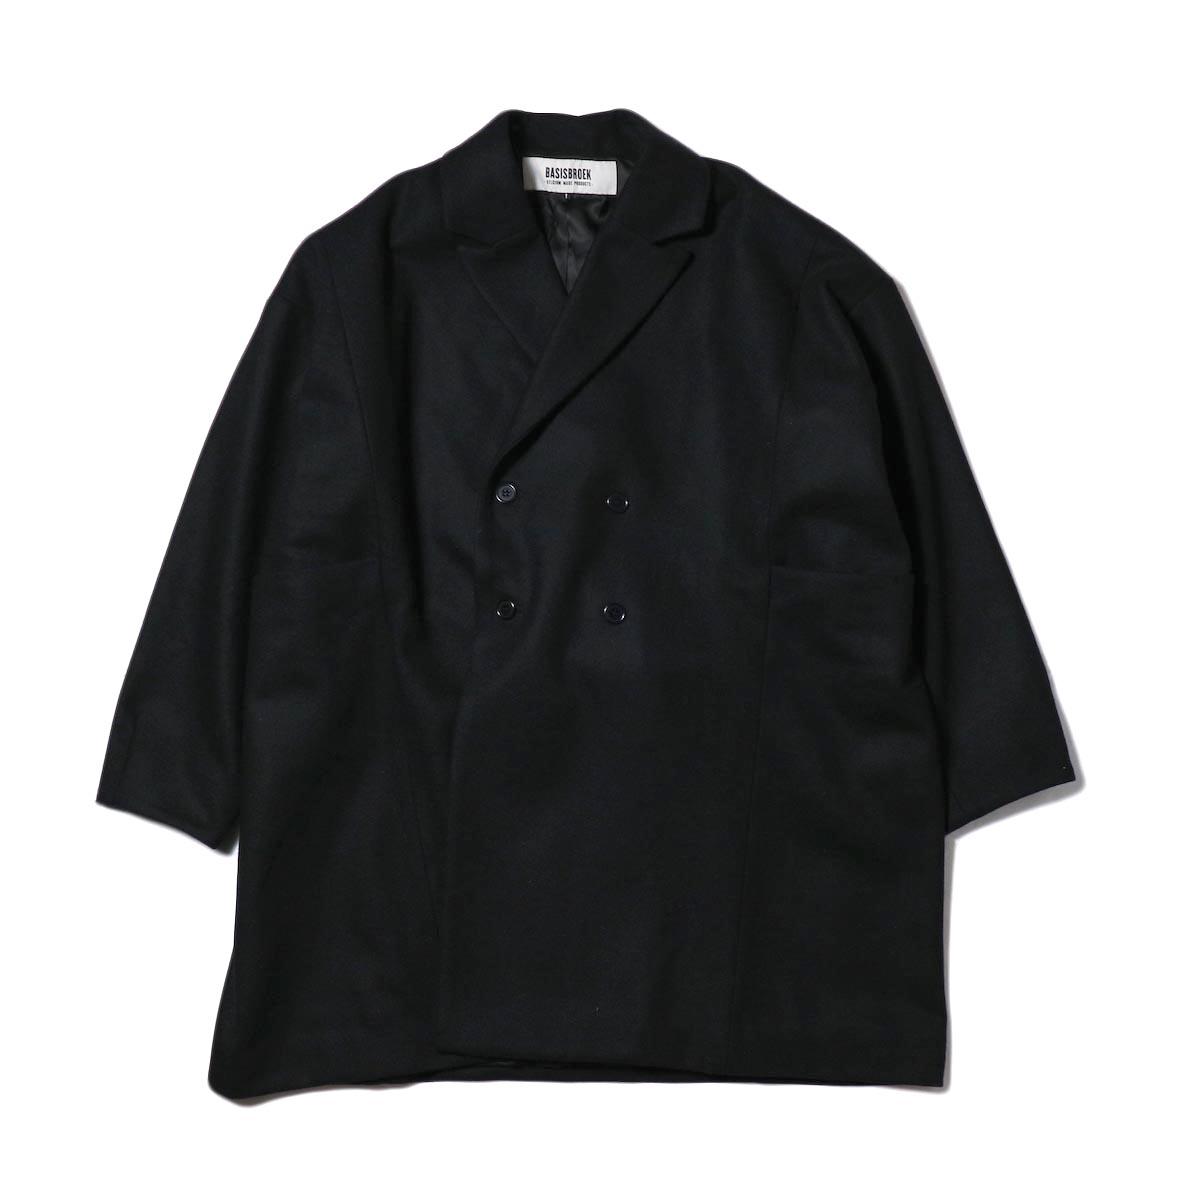 BASISBROEK / EGG SPARK COAT (black)